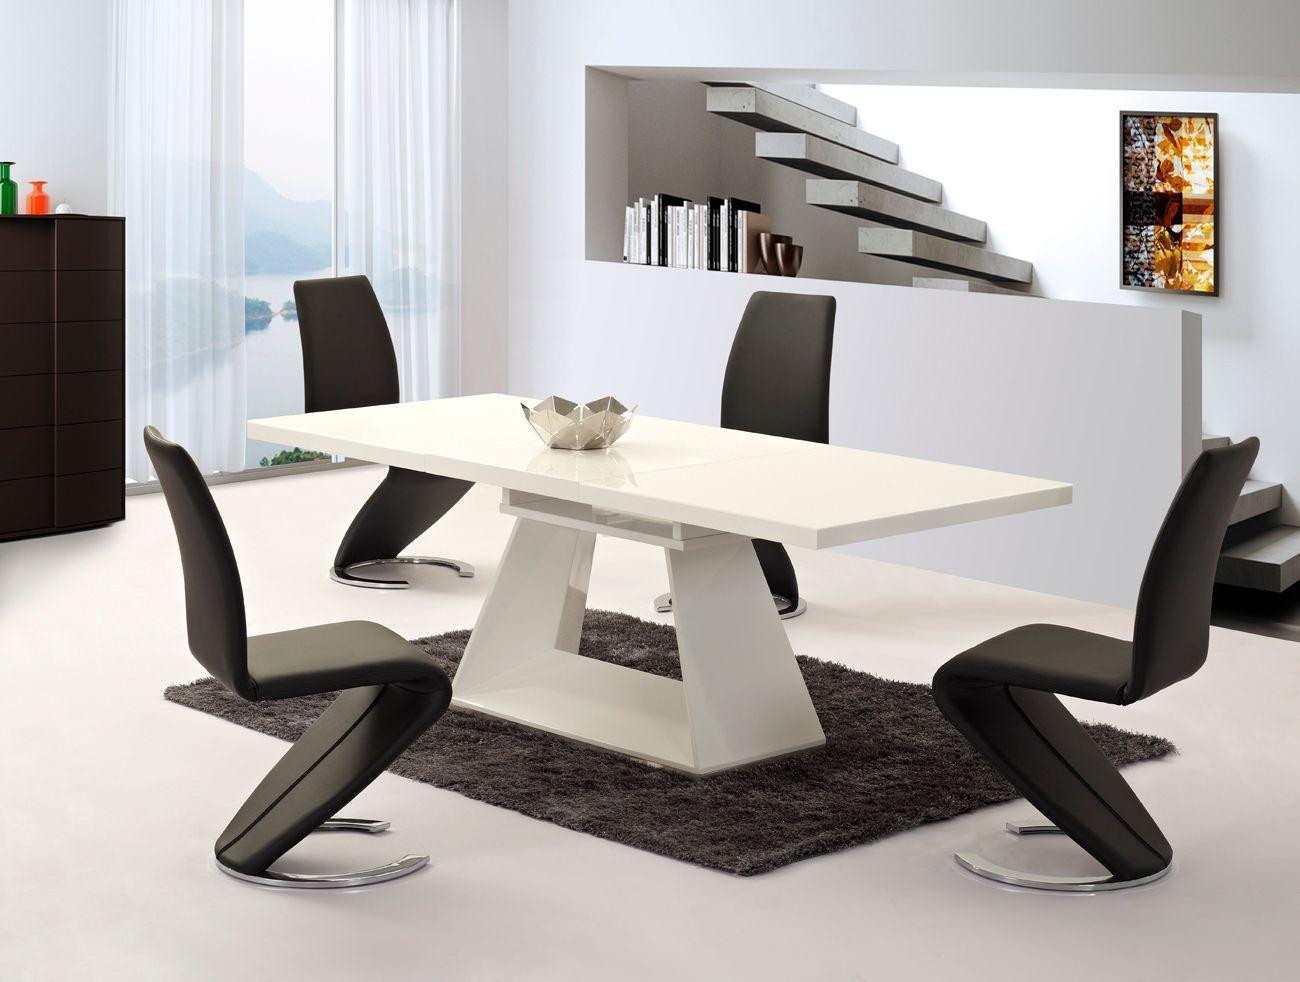 Extending Dining Table Sets Uk - Castrophotos